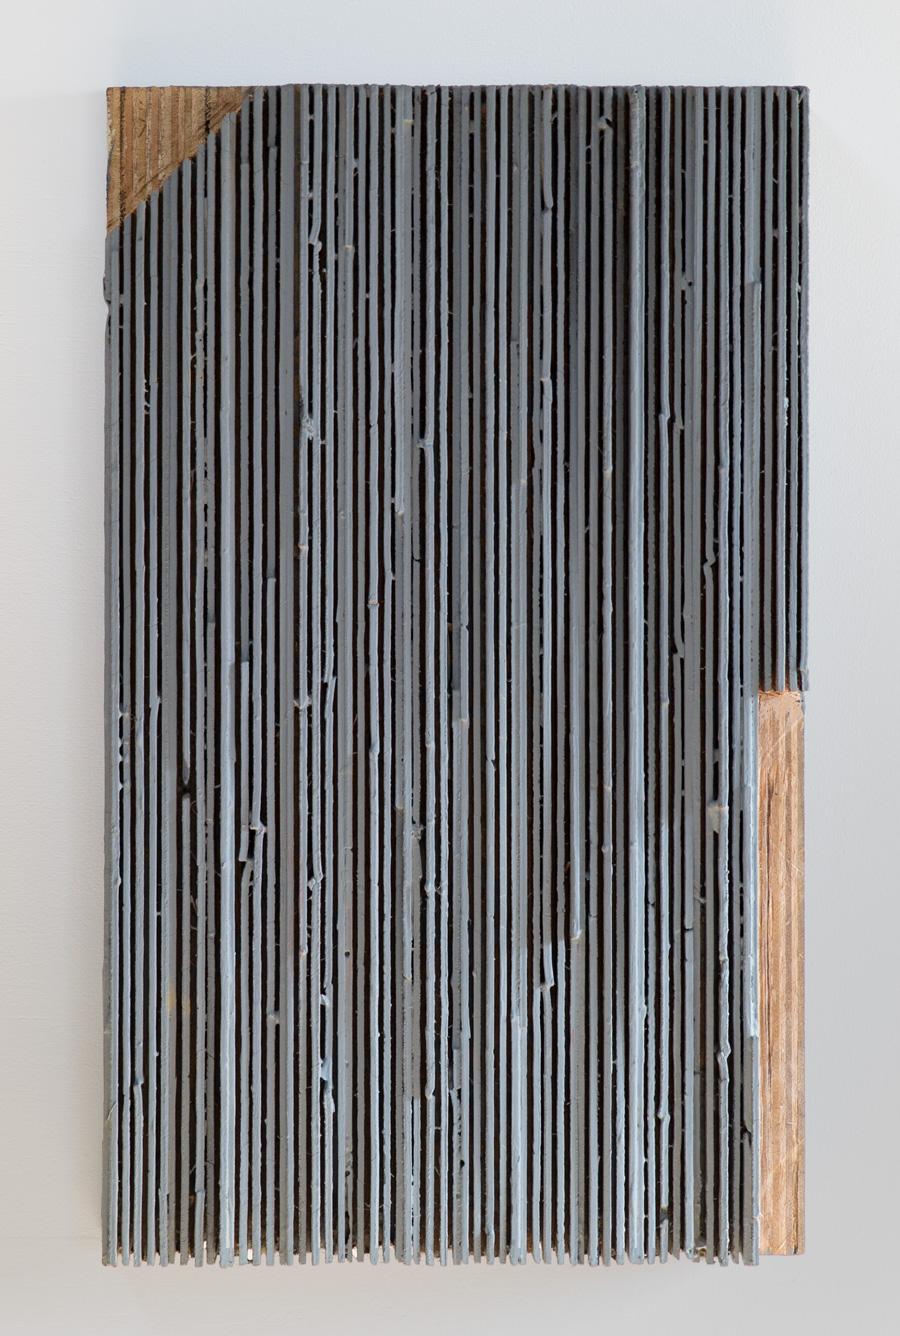 Emergence of a Plain , 1984–1991 平野の成立ち ( Heiya no Naritachi ) Wood, acrylic  23 x 15 3/8 x 3 1/2 inches 66 x 39 x 9 centimeters